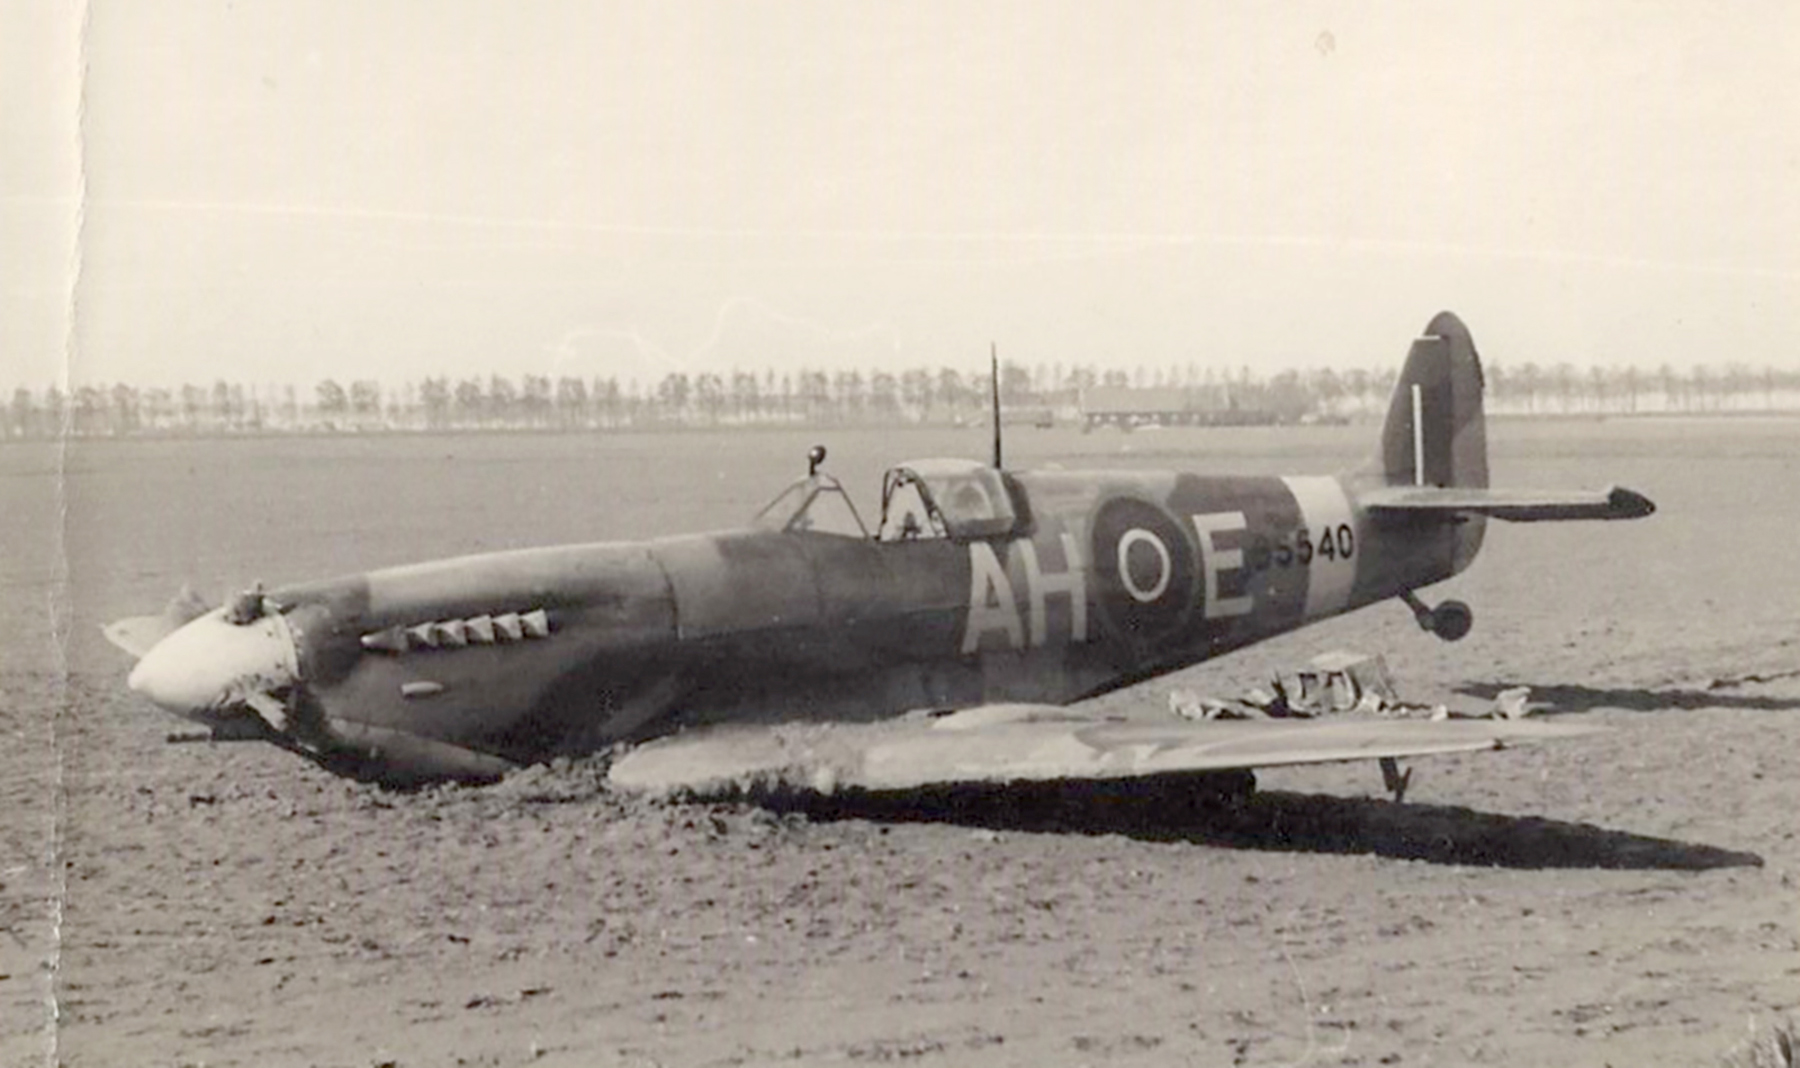 Spitfire MkIX RAF 332Sqn AHE BS540 Lt NJ Fuglesang sd by Fw 190s nr Walcheren 2 May 1943 POW 01